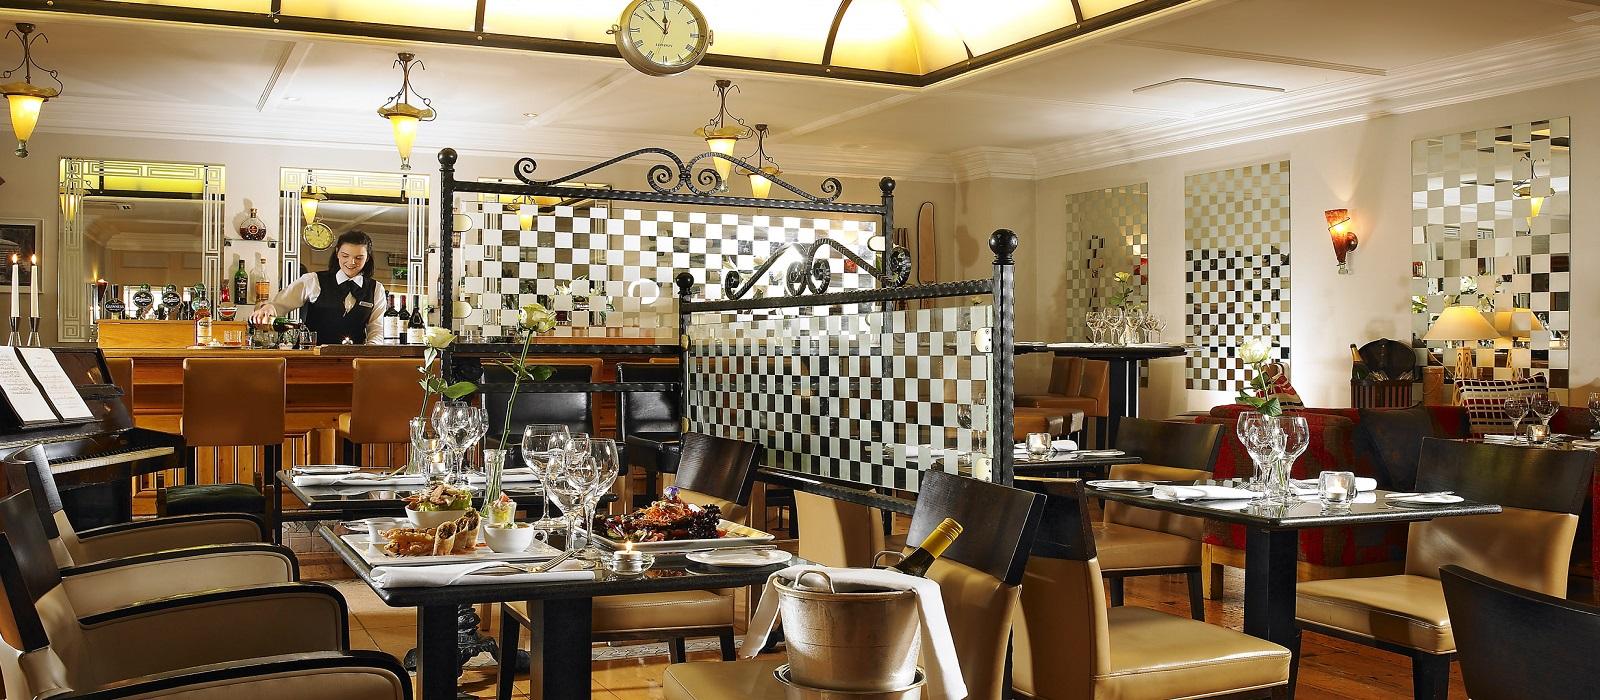 Killarney Royal A Luxury Boutique Hotel In Killarney Town